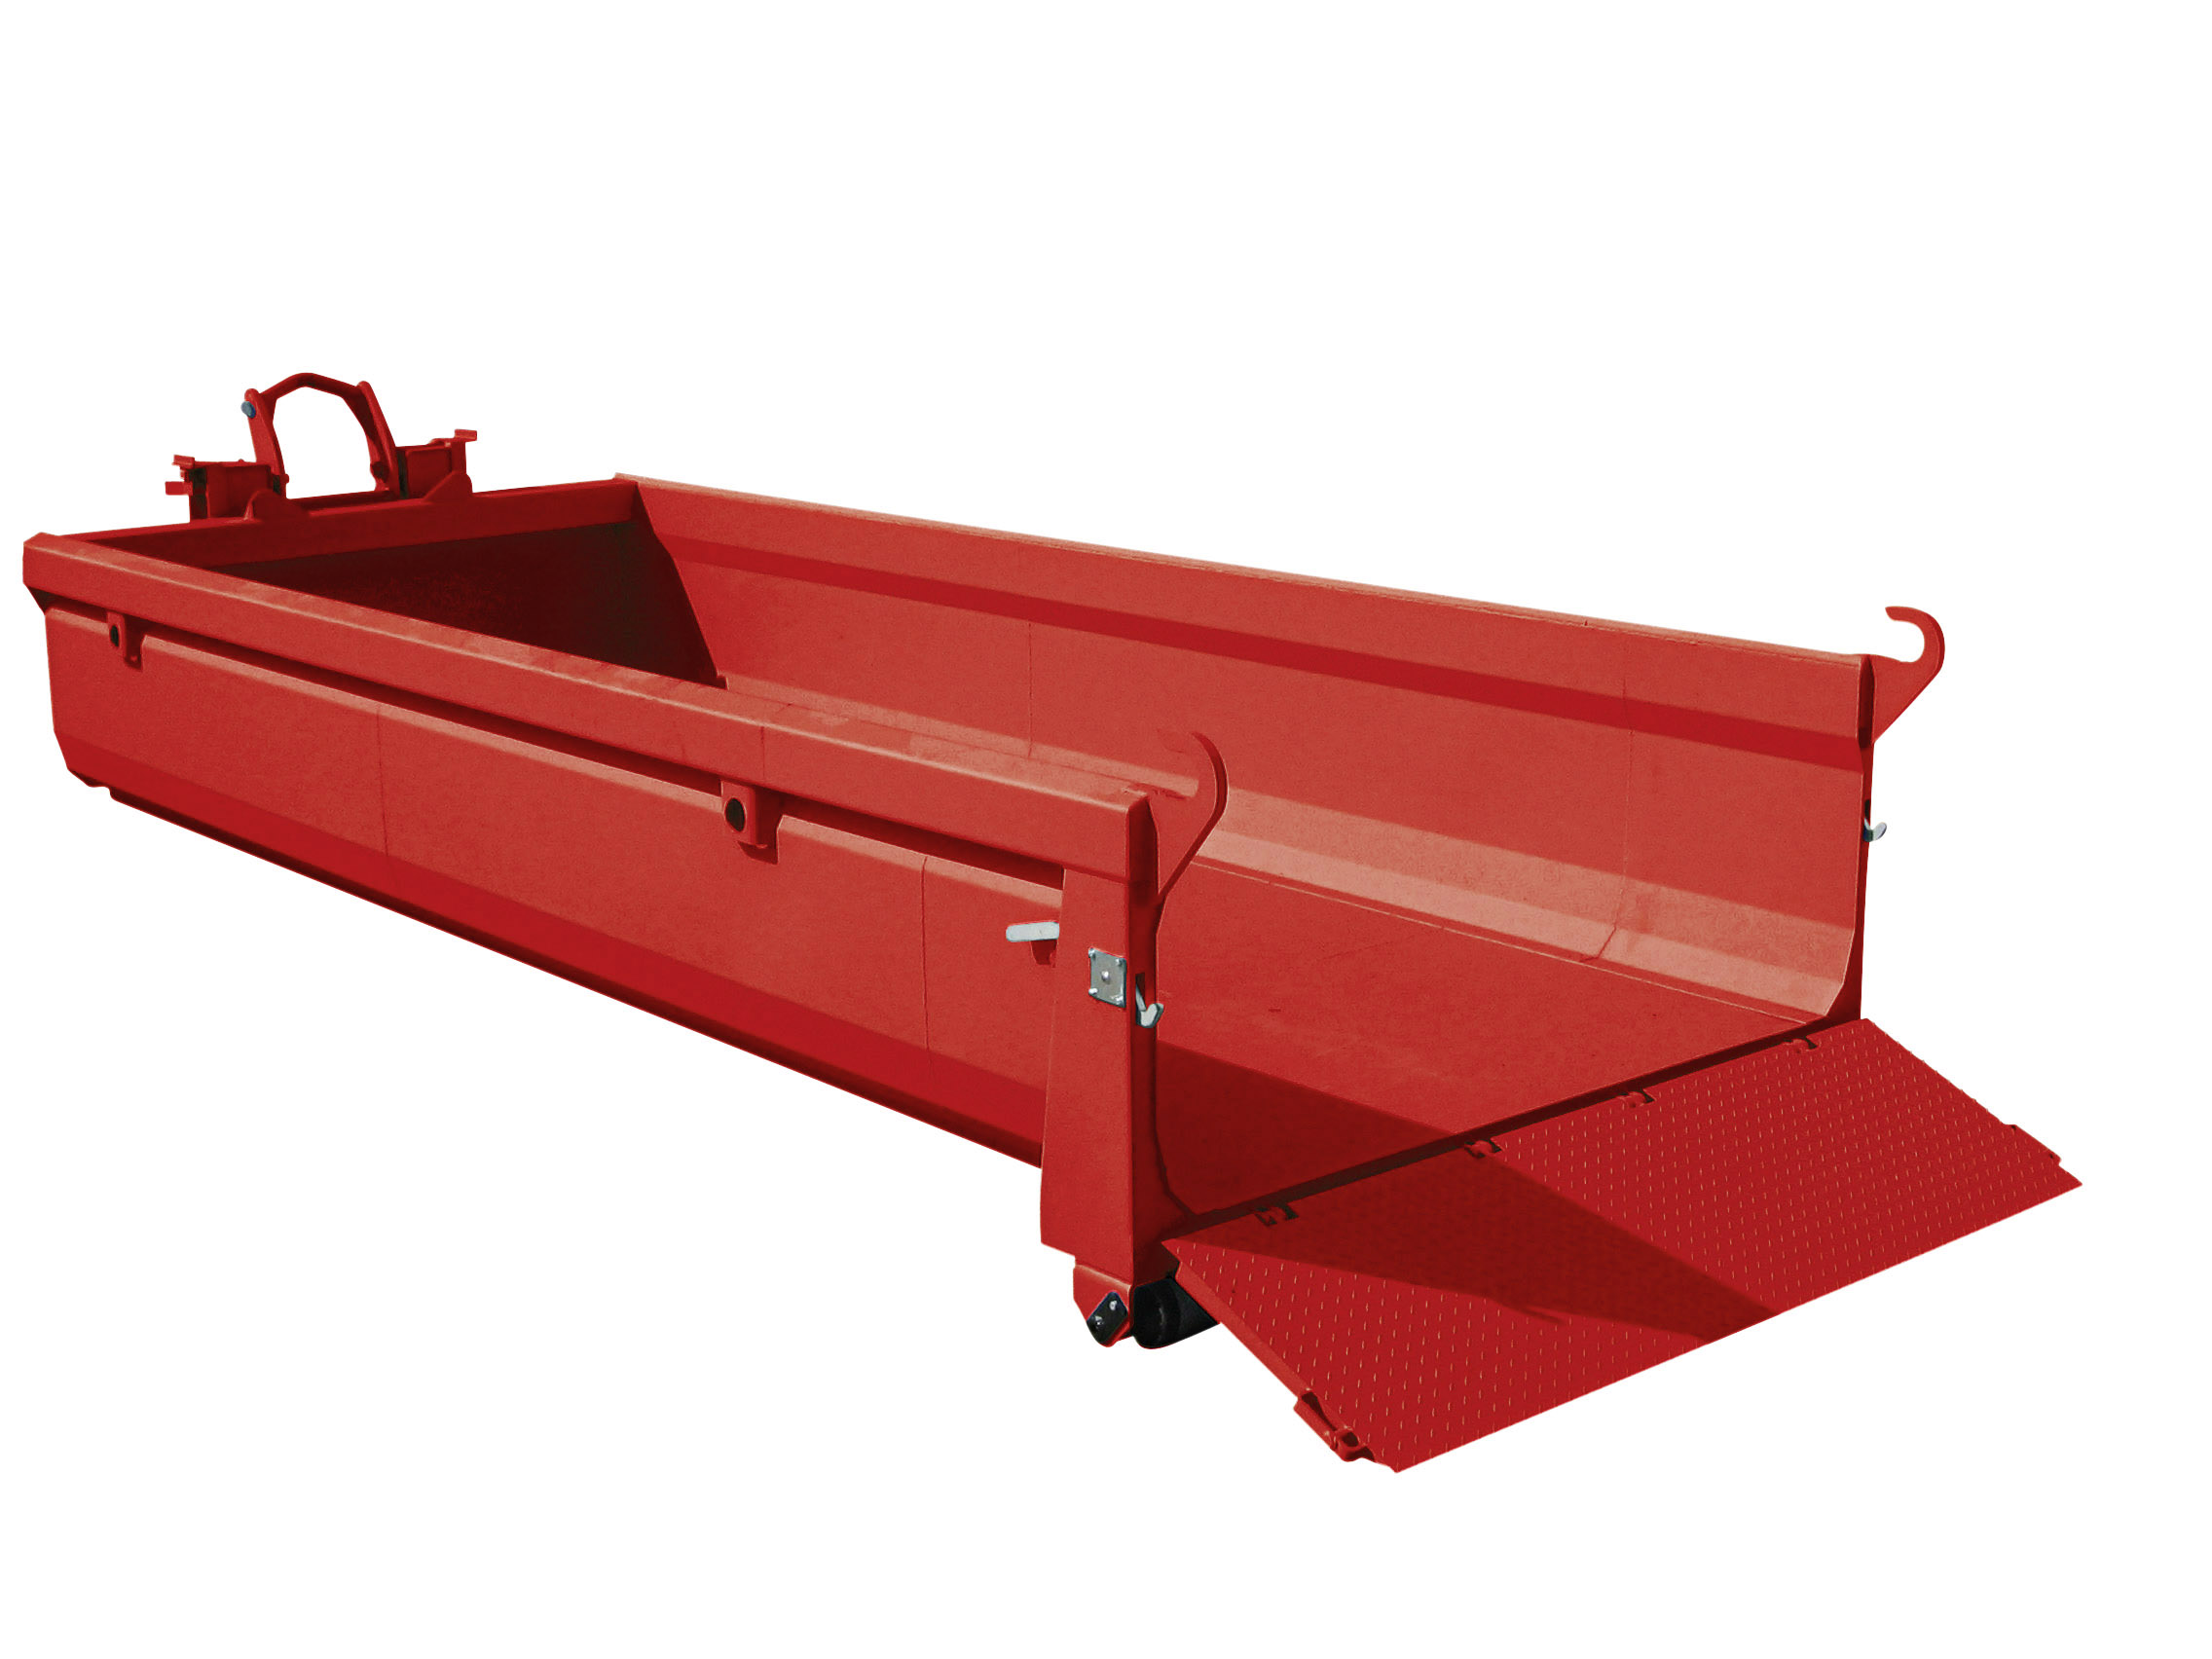 Roter stapelbarer Container Petrolfarbener ORCA Abrollcontainer von UT Umwelt- und Transporttechnik AG